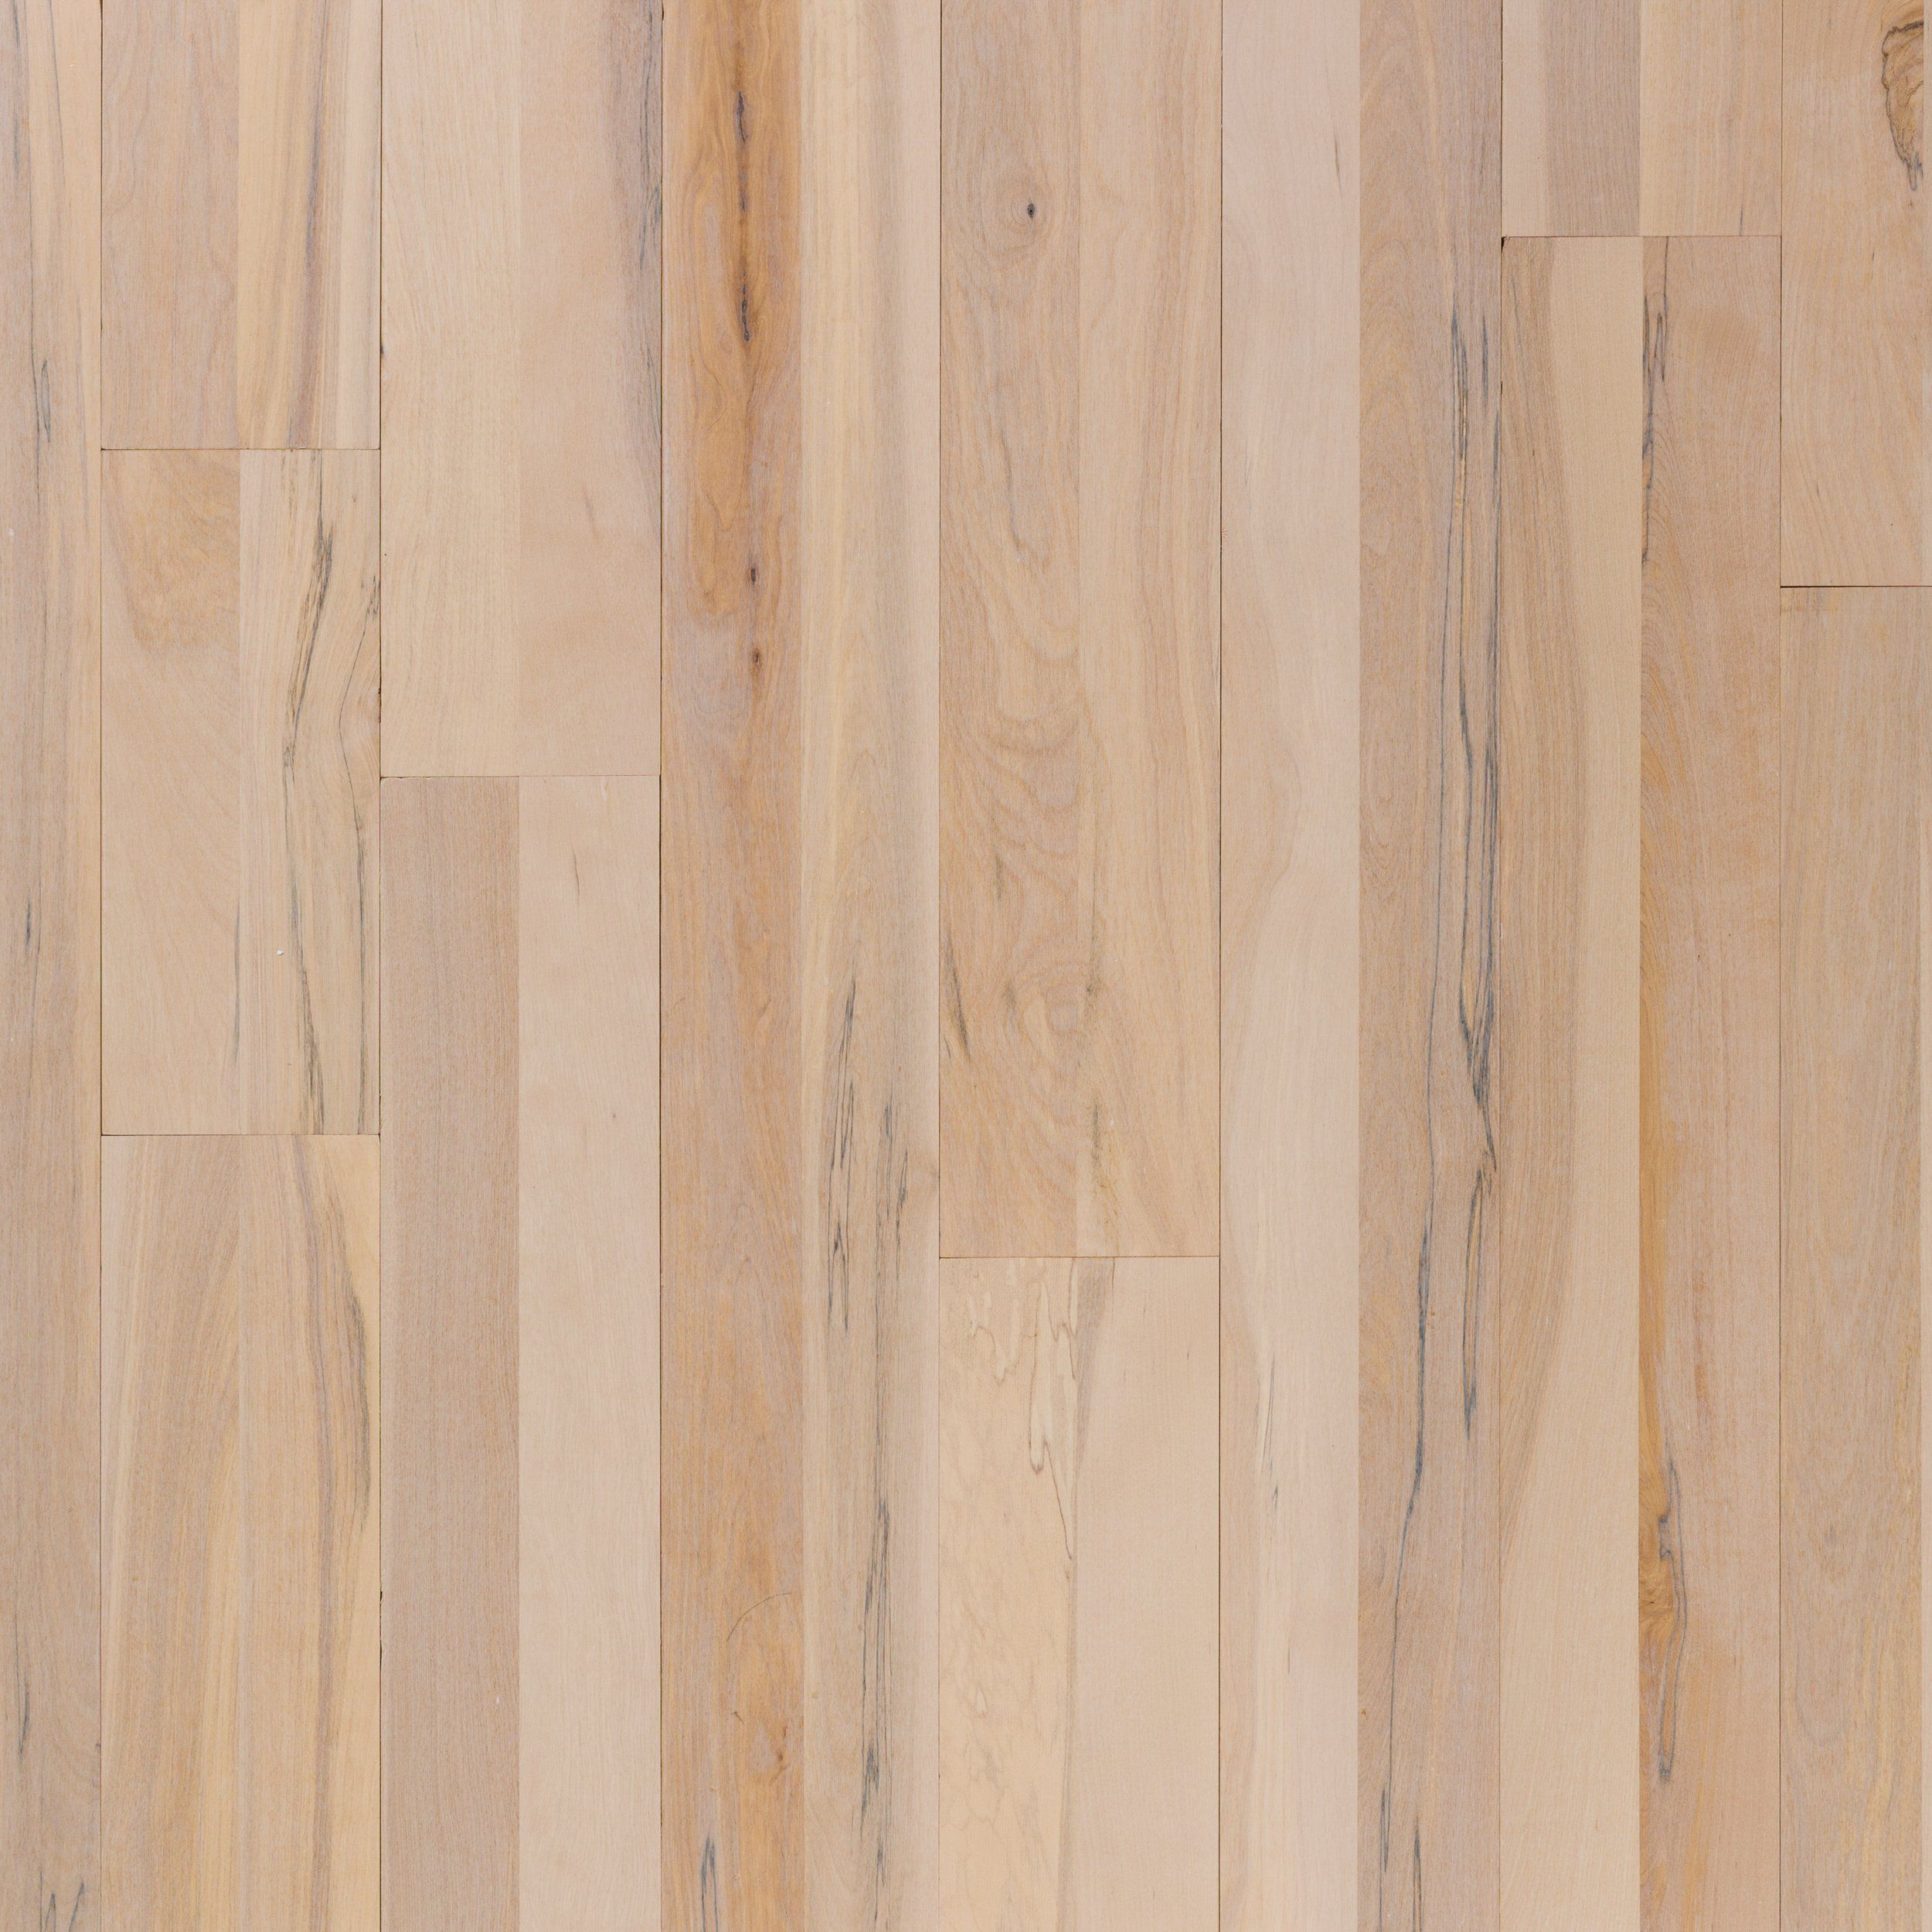 Natural Oak Smooth Solid Hardwood In 2020 Hardwood Birch Floors